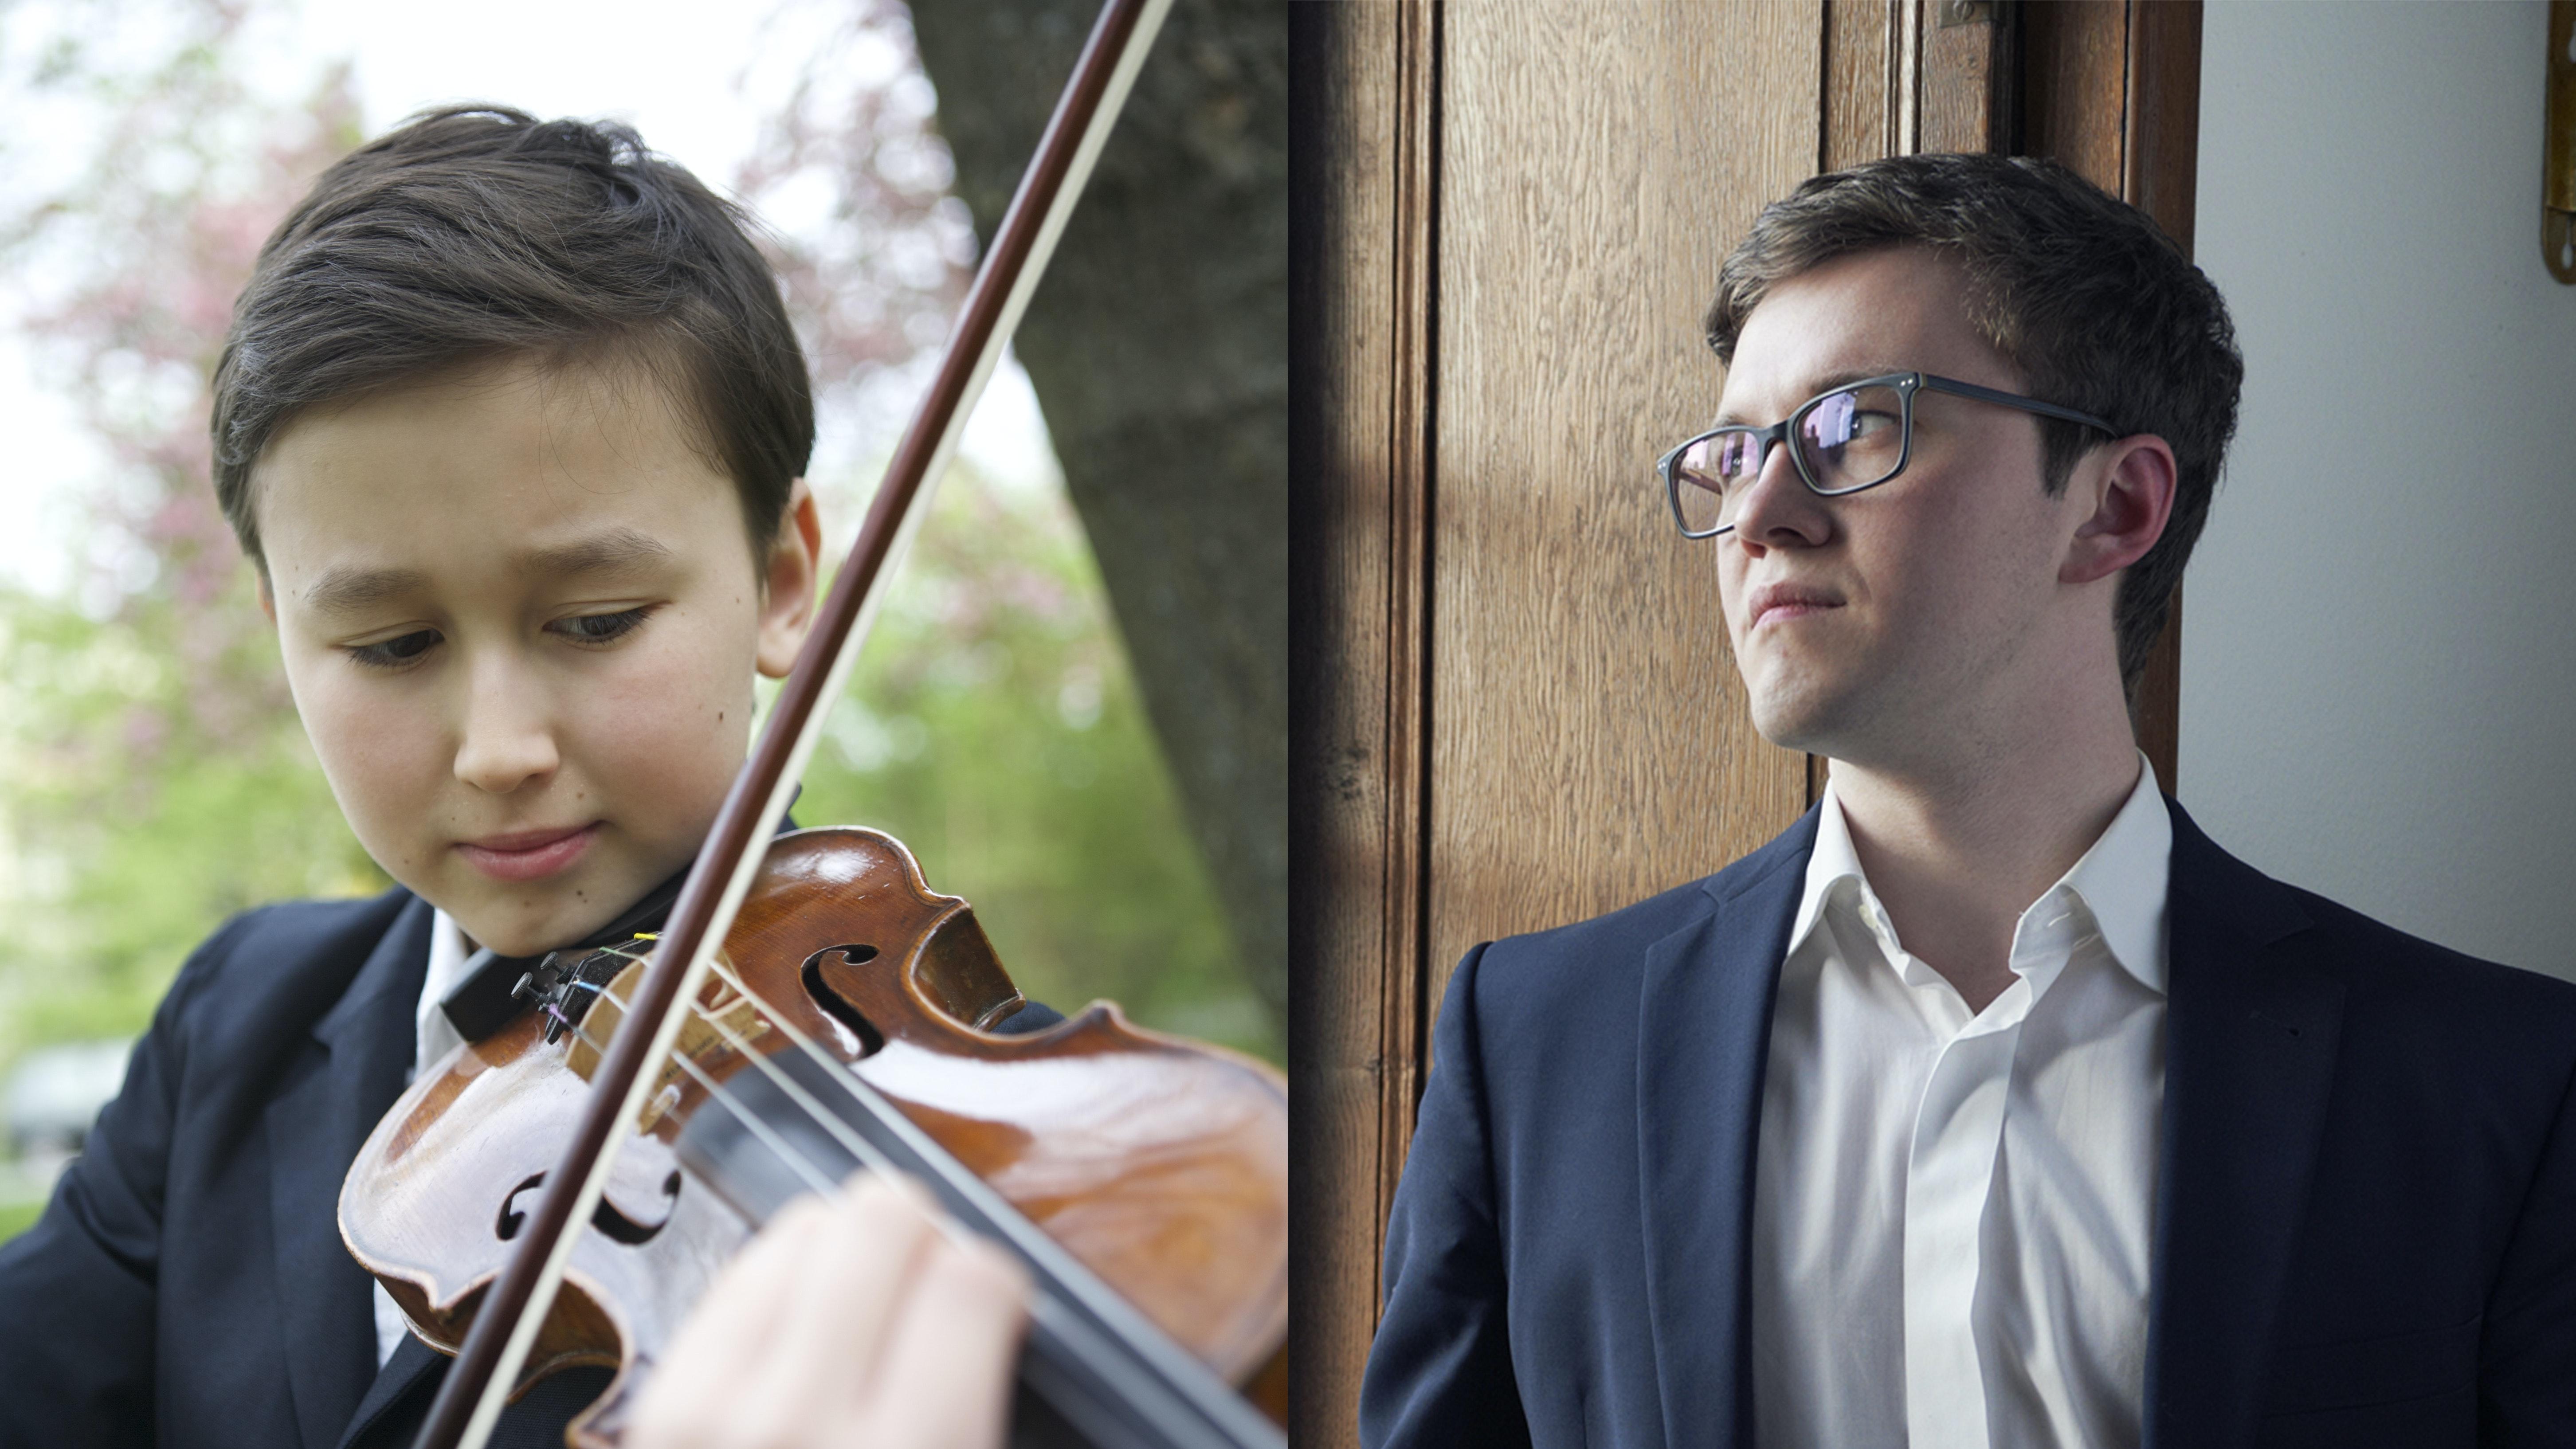 Daniel Lozakovich and Frank Dupree perform Bach, Mozart and Brahms